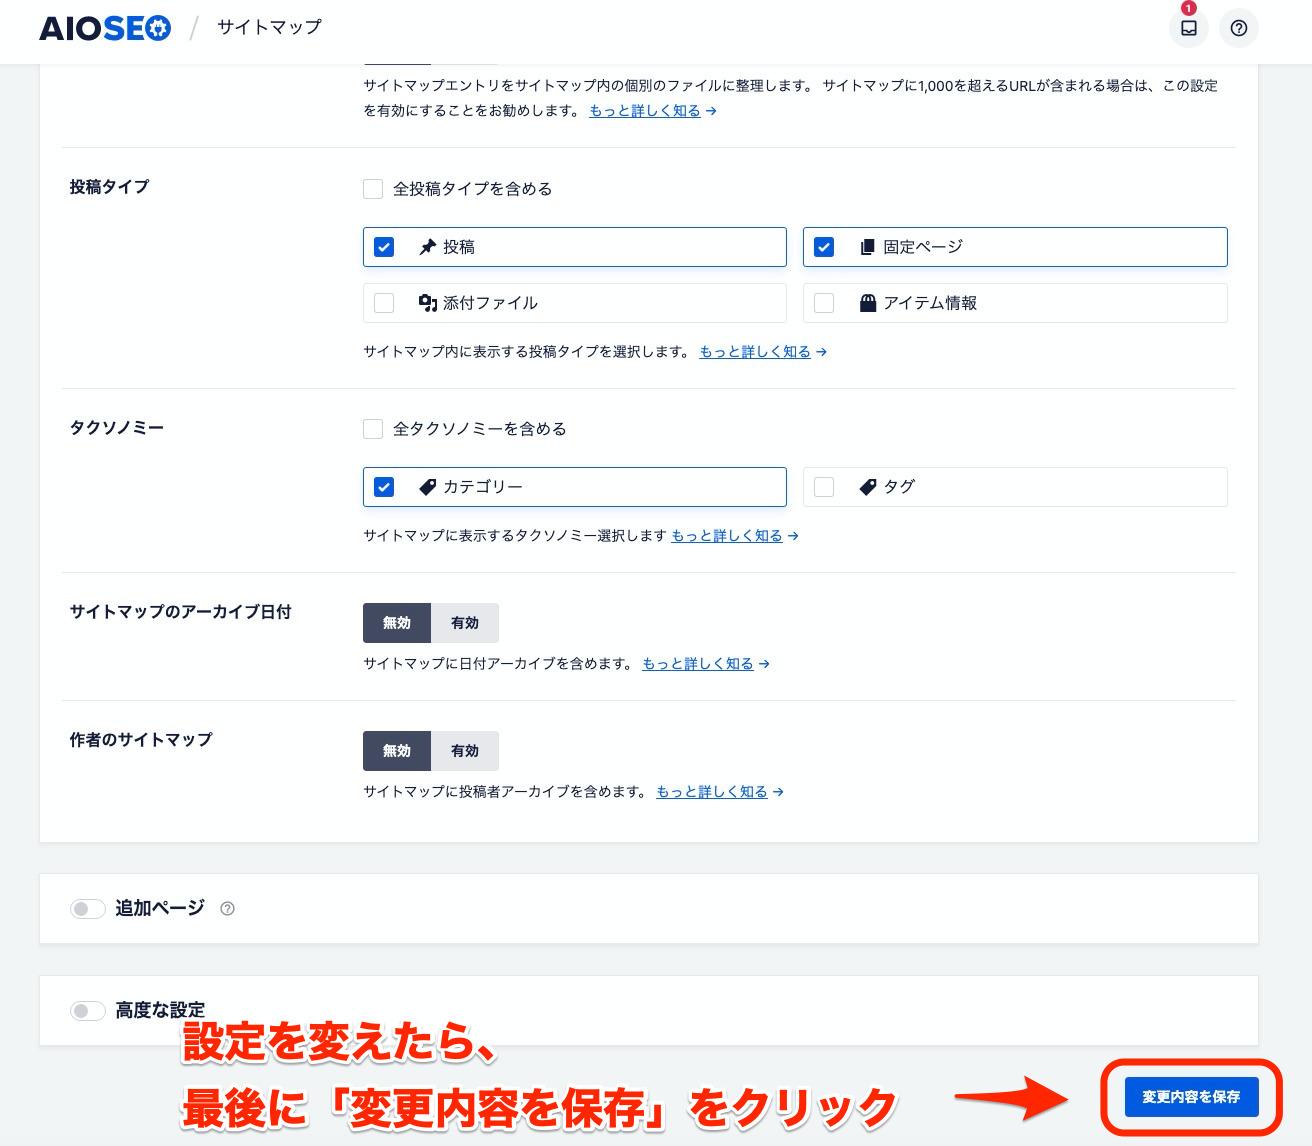 AIOSEO サイトマップ